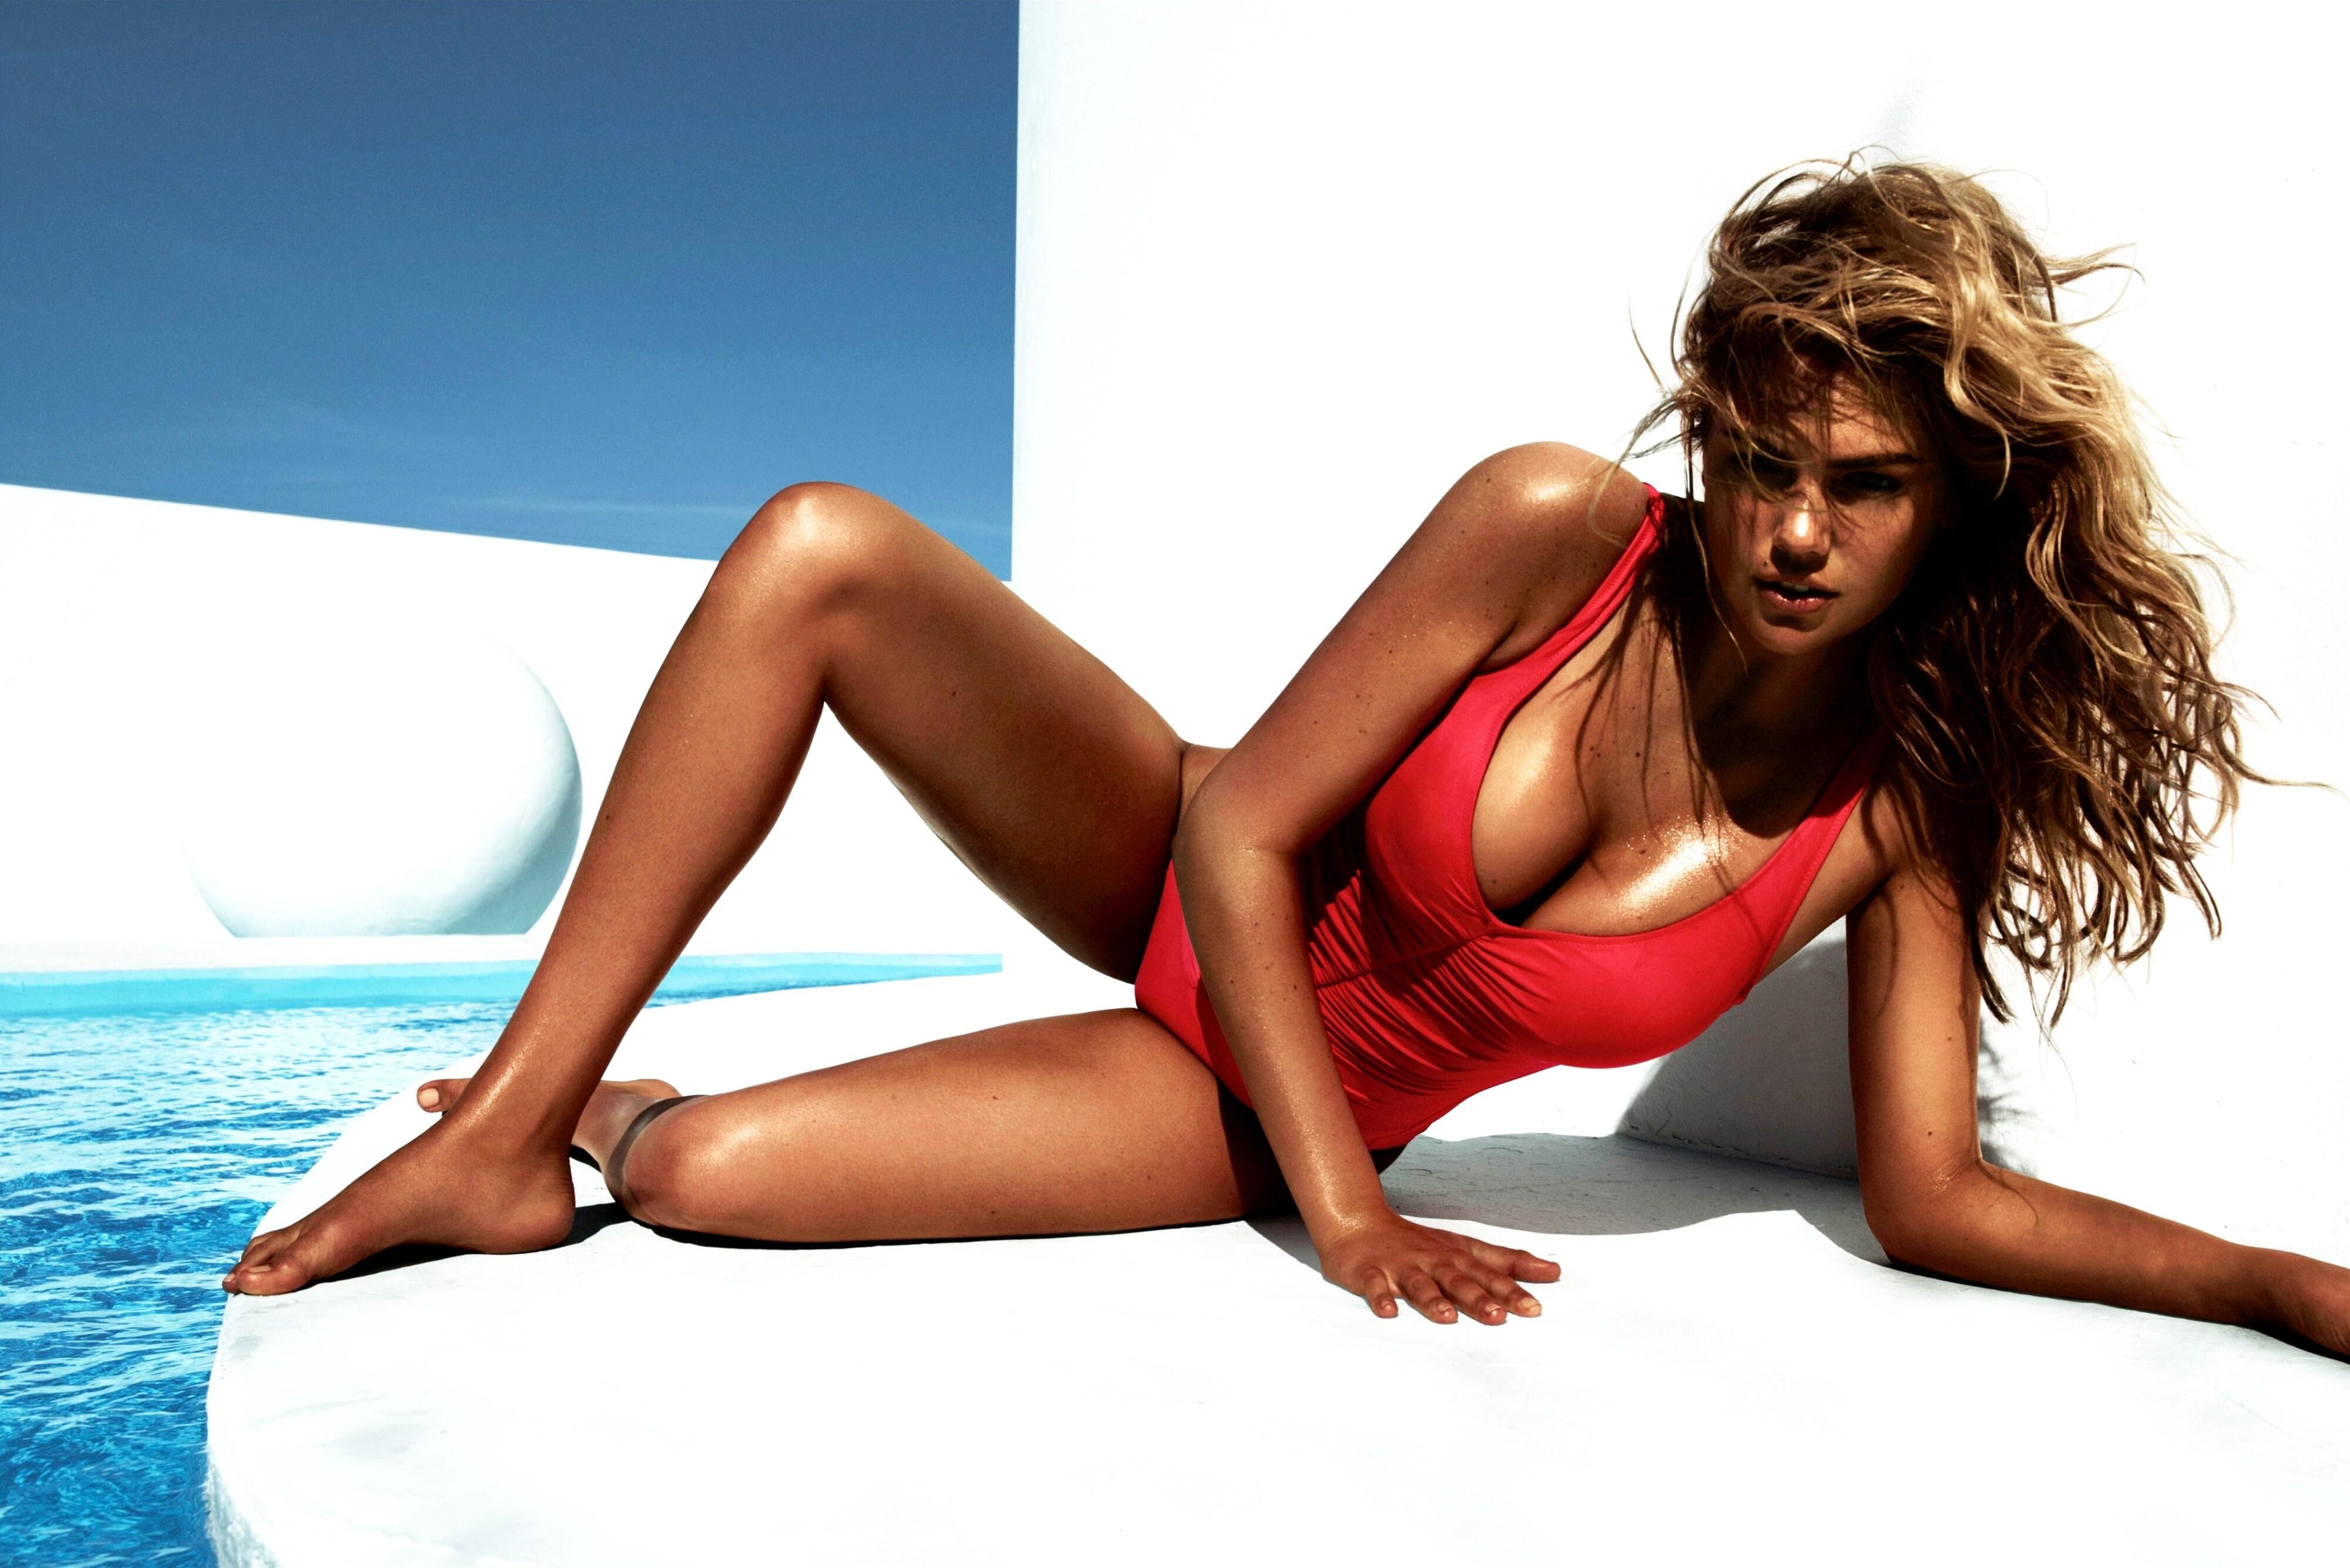 Kate Upton Bikini Wallpaper Hd Celebrities 4k Wallpapers Images